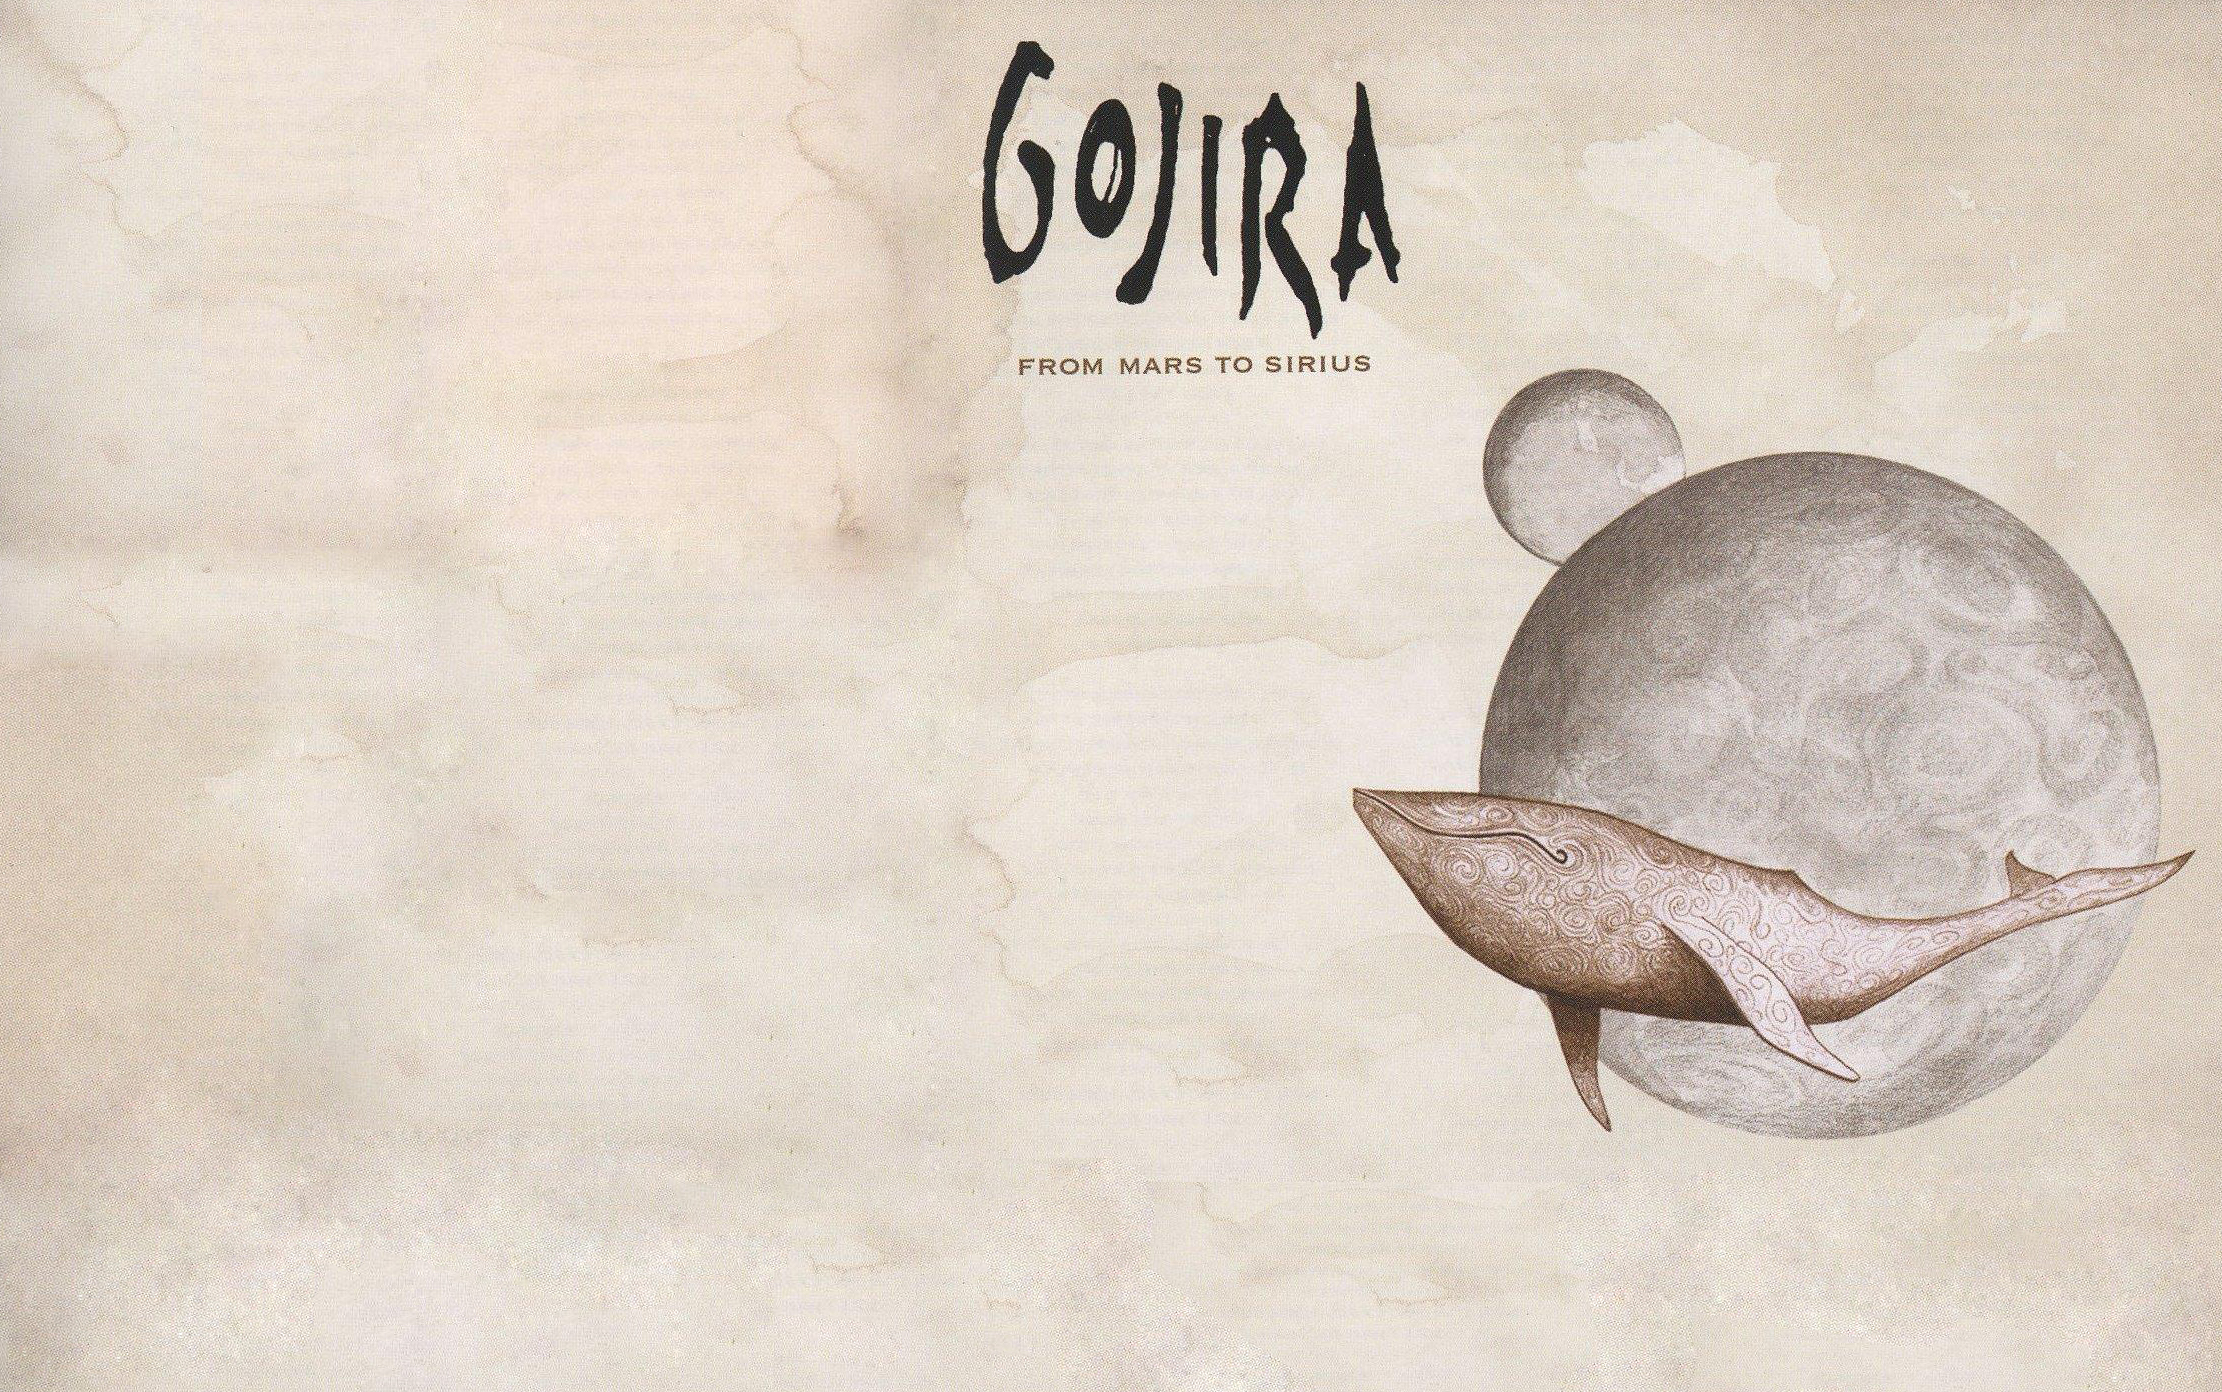 Gojira HD Wallpaper Background Image 2222x1392 ID233647 2222x1392